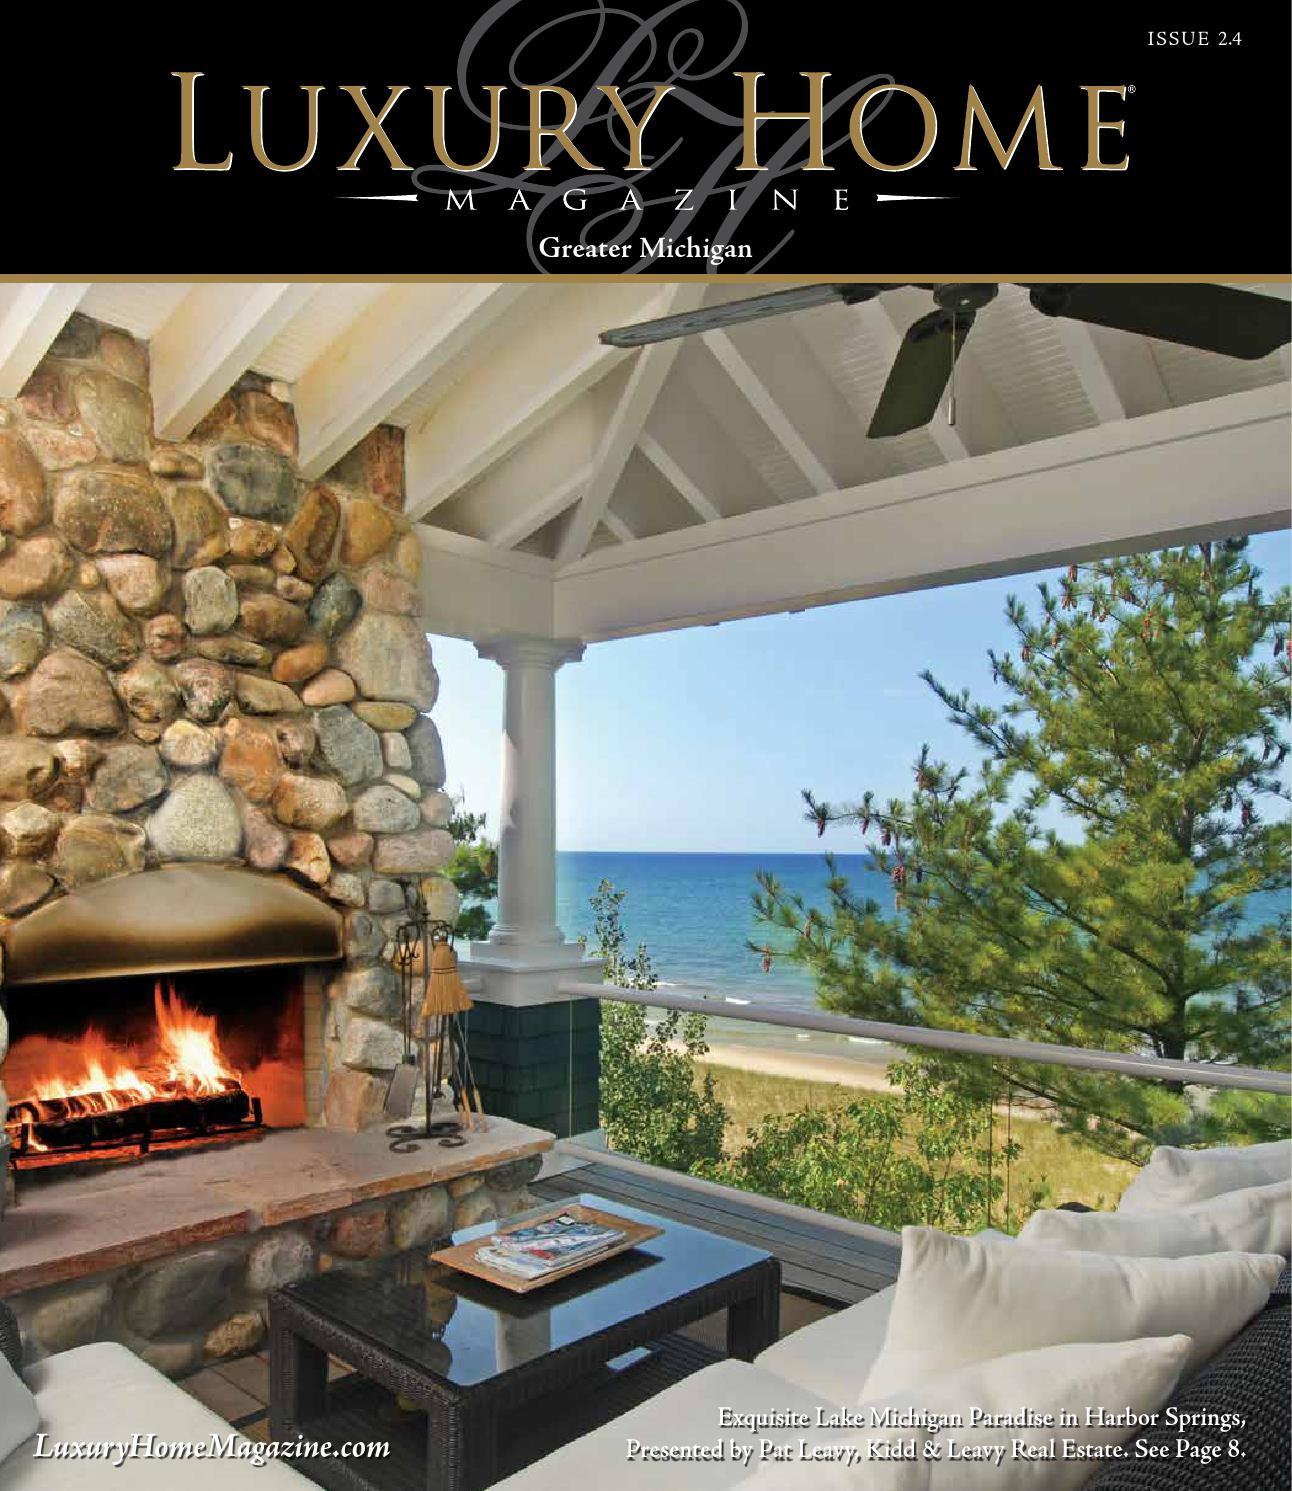 Lake Michigan Luxury Homes: Luxury Home Magazine Greater Michigan Issue 2.4 By Luxury